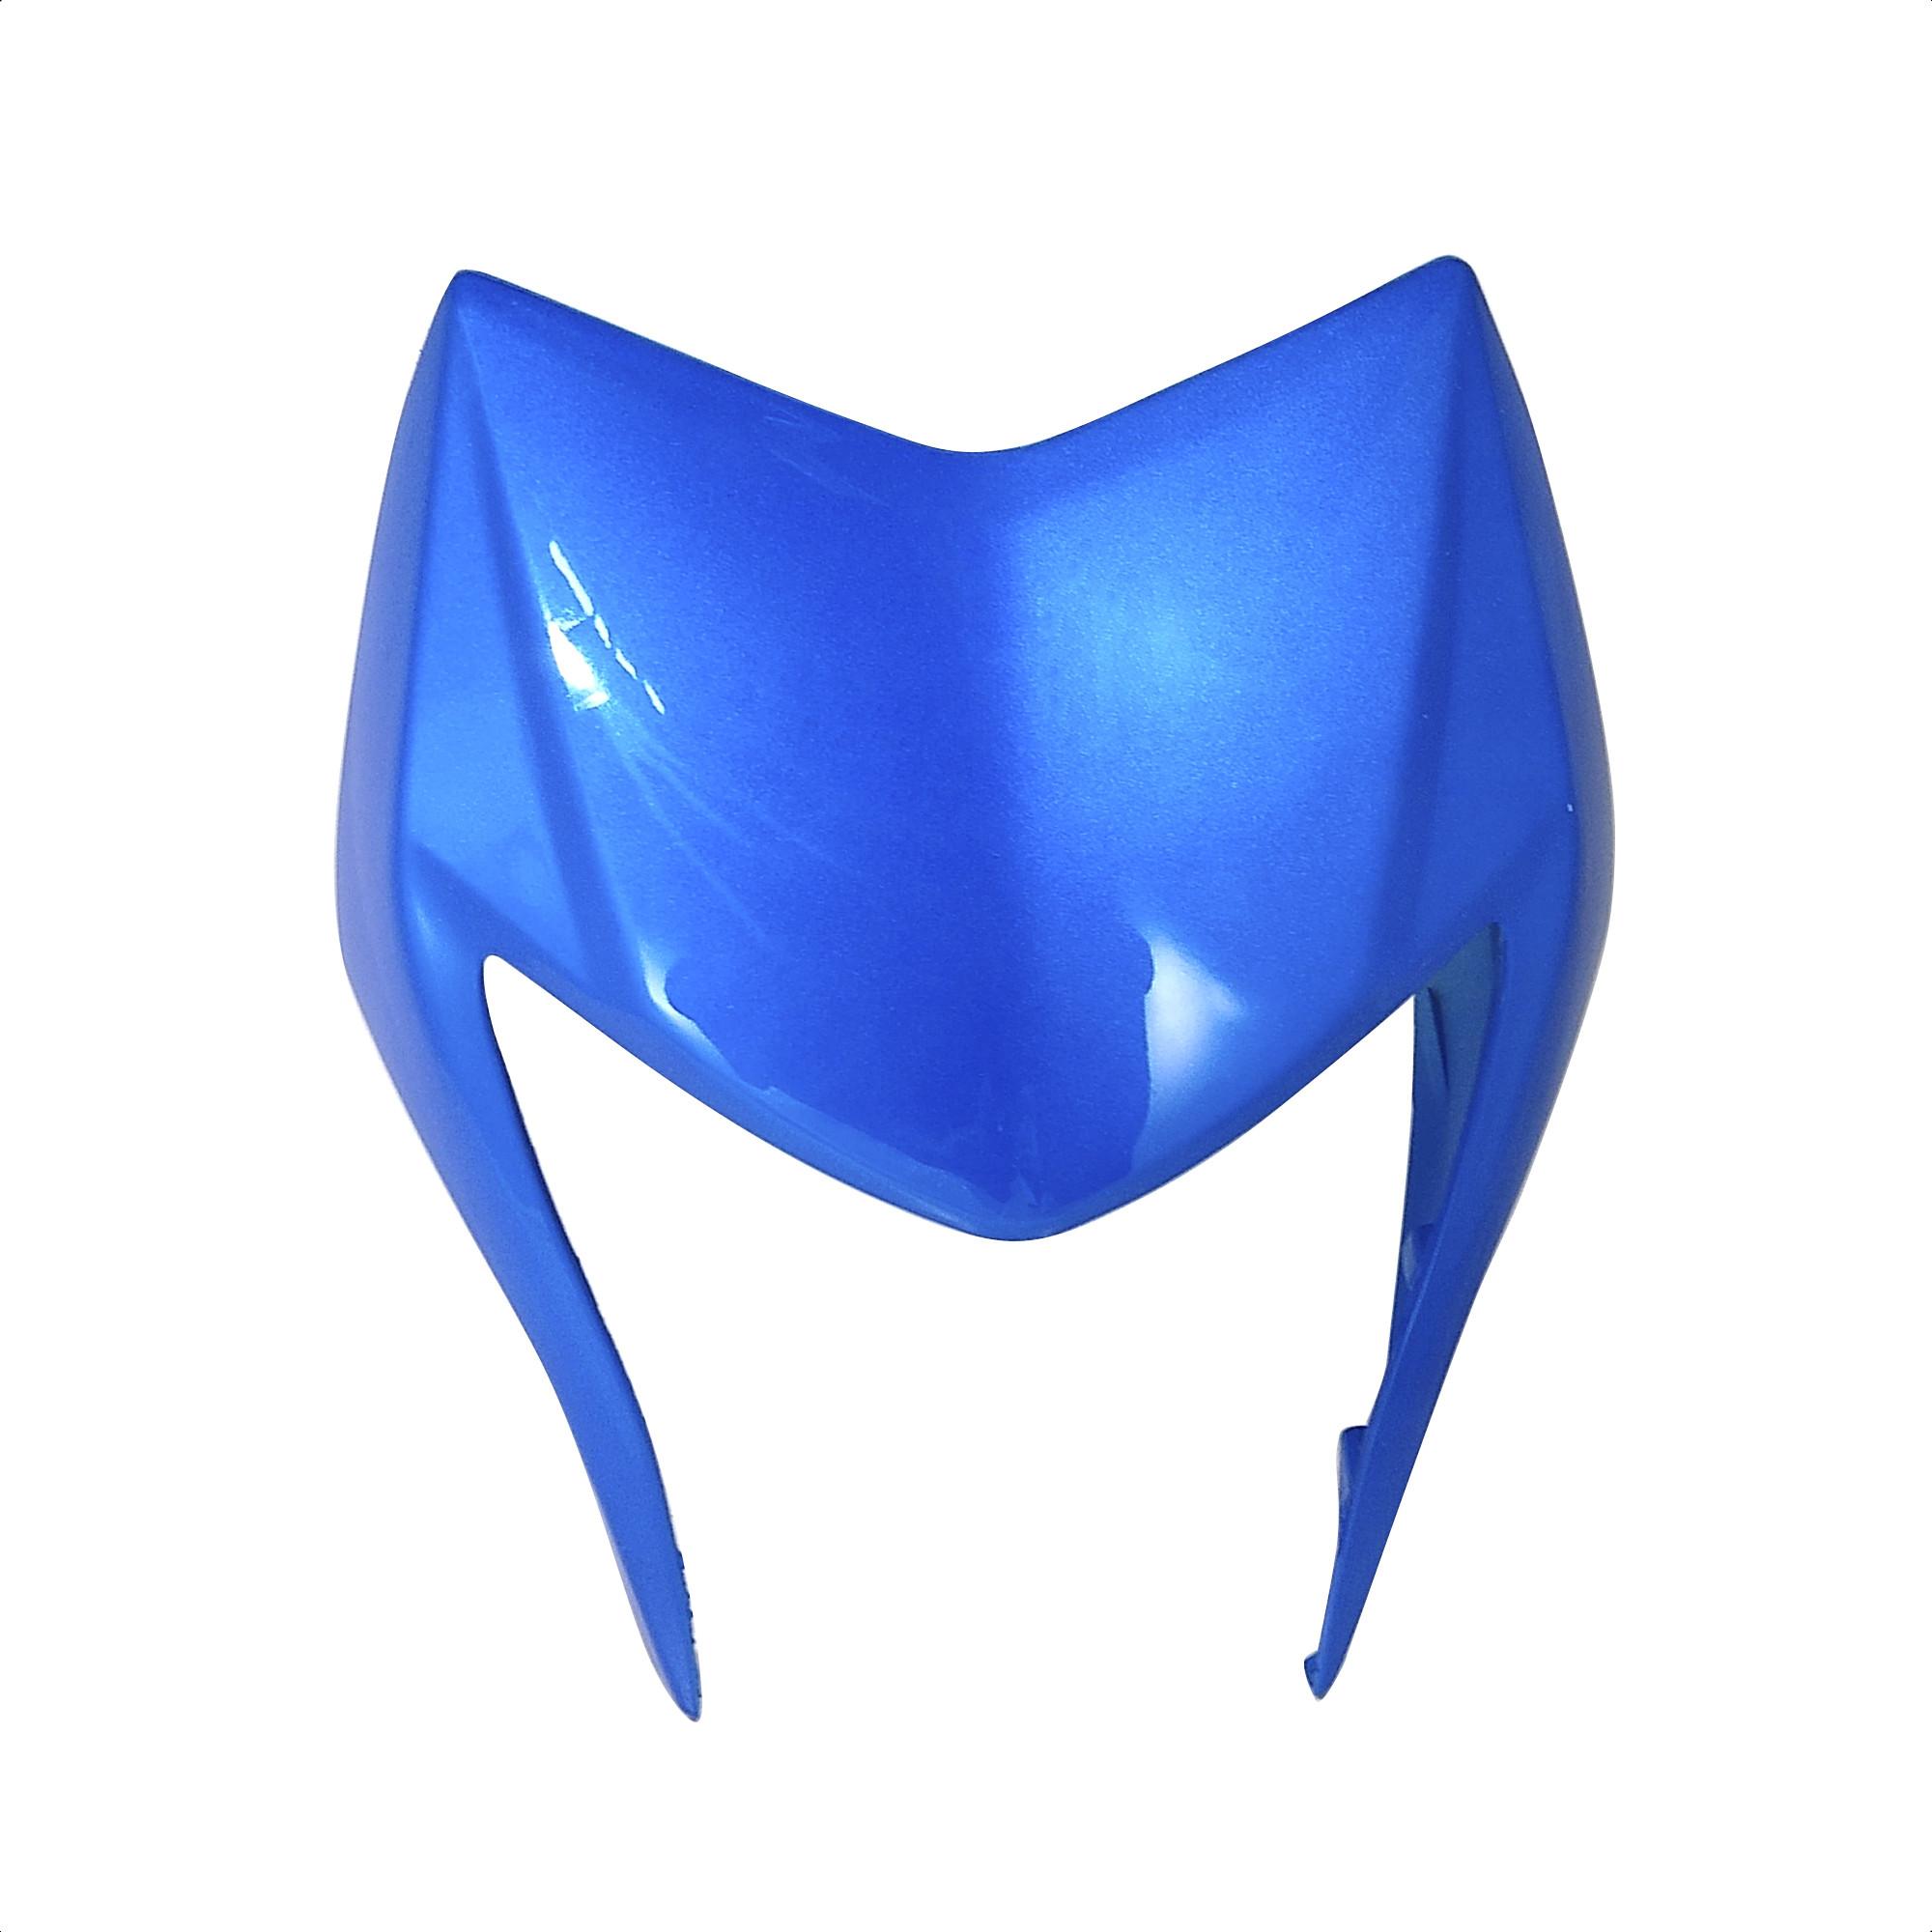 Cacha Mascara Cubre Optica Azul Zanella Zr 150 Lt Original